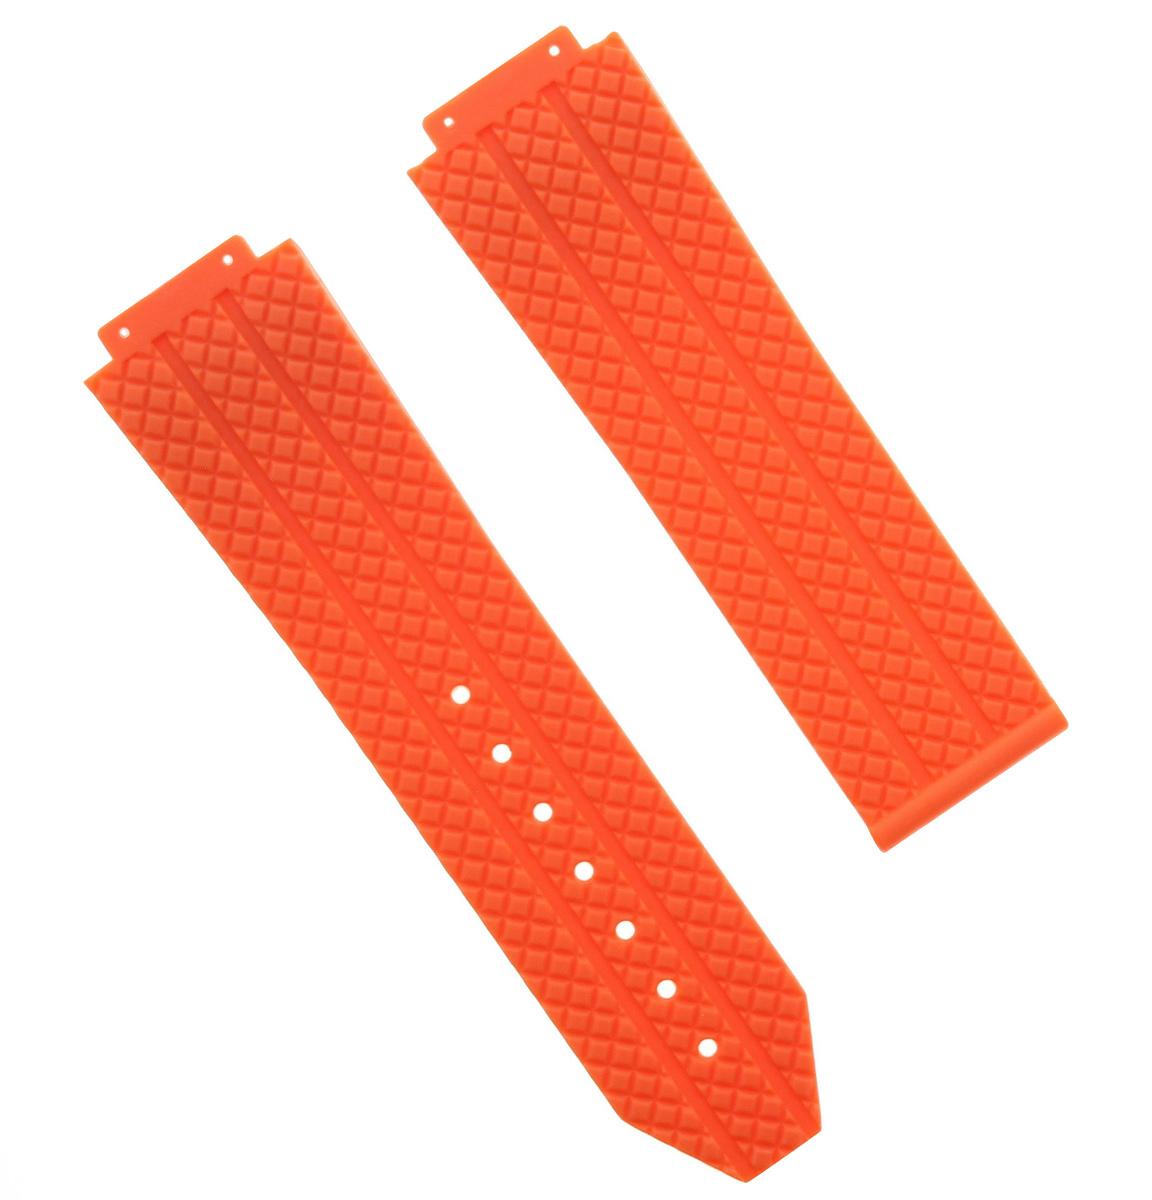 4 Screw White 6Hsc 24Mm Rubber Band Strap For Hublot 44-45Mm H Big Bang